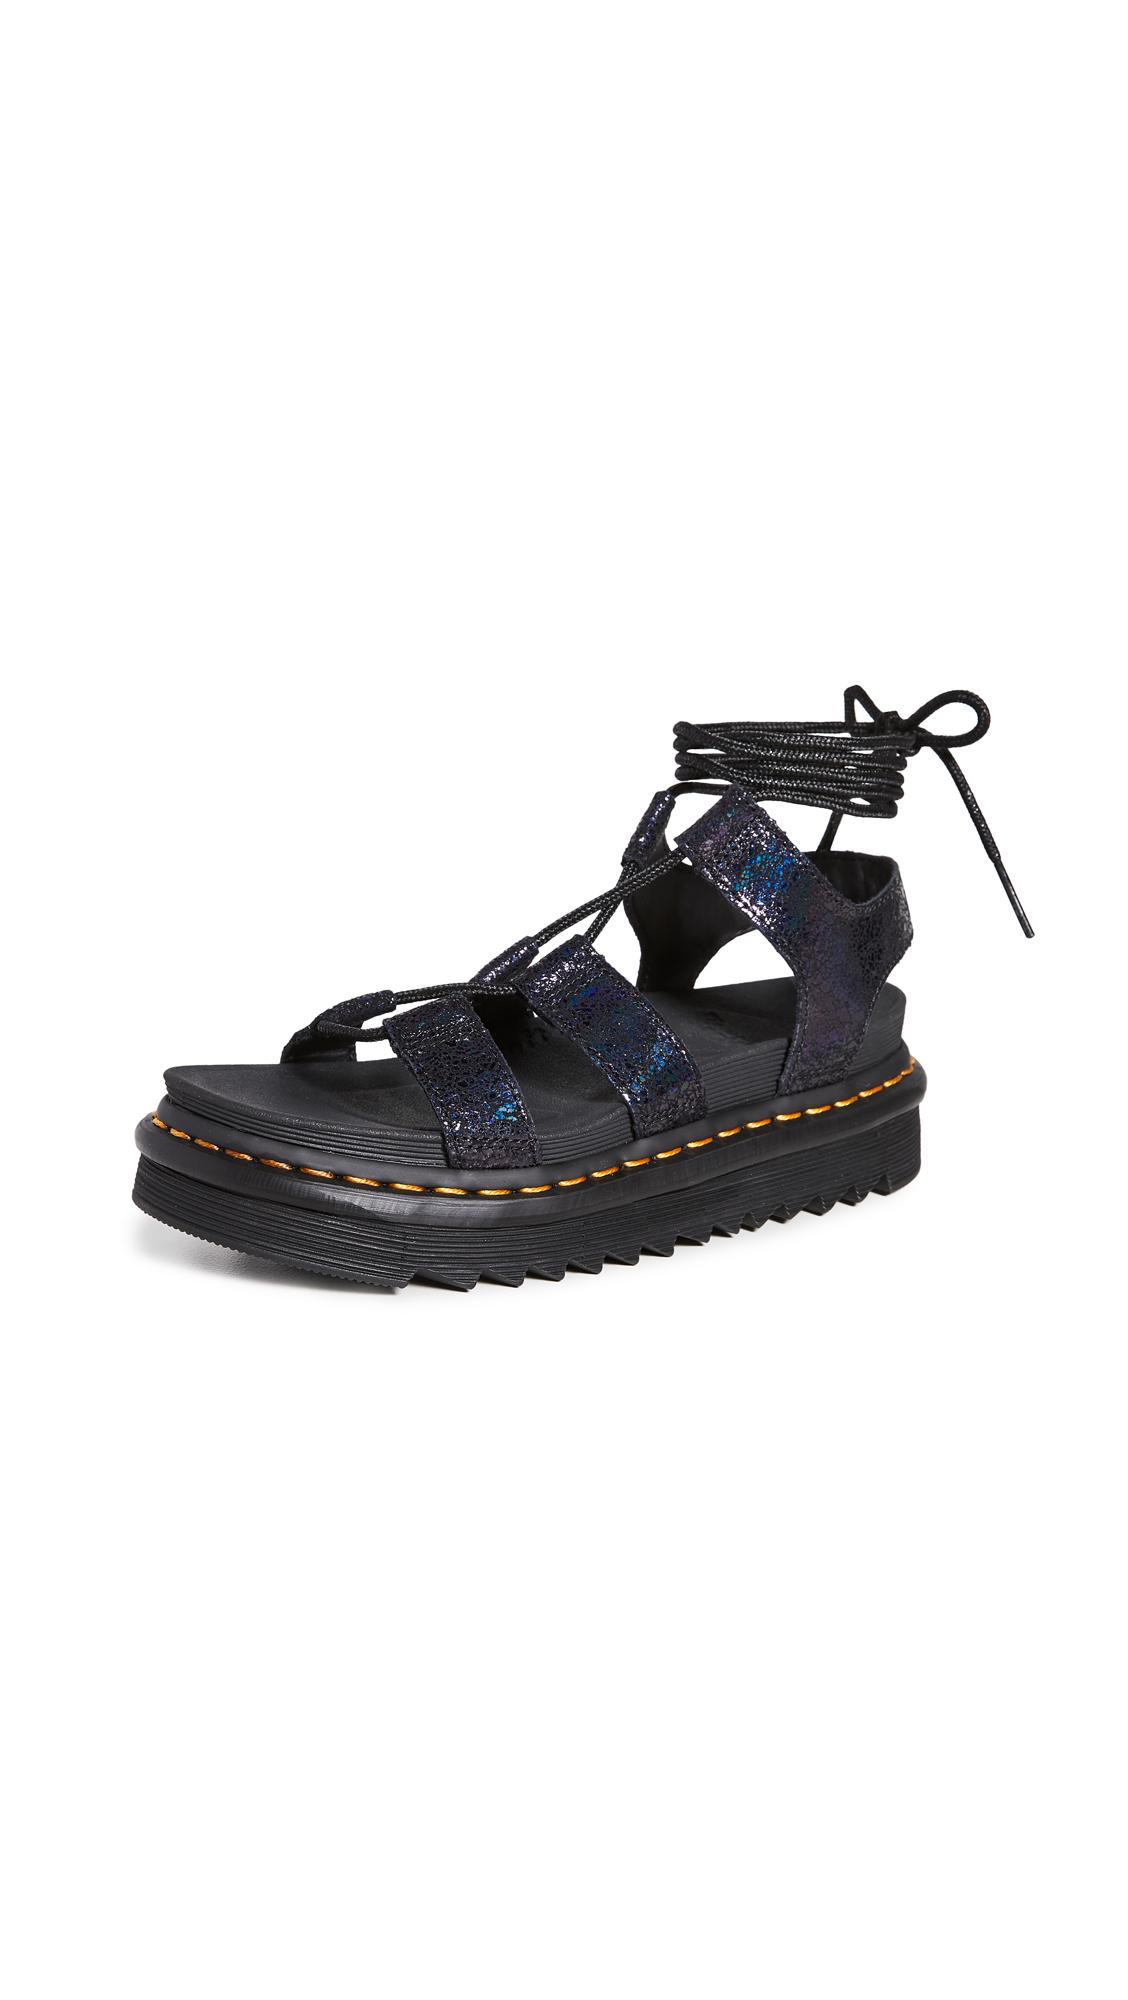 Buy Dr. Martens Nartilla II Sandals online, shop Dr. Martens